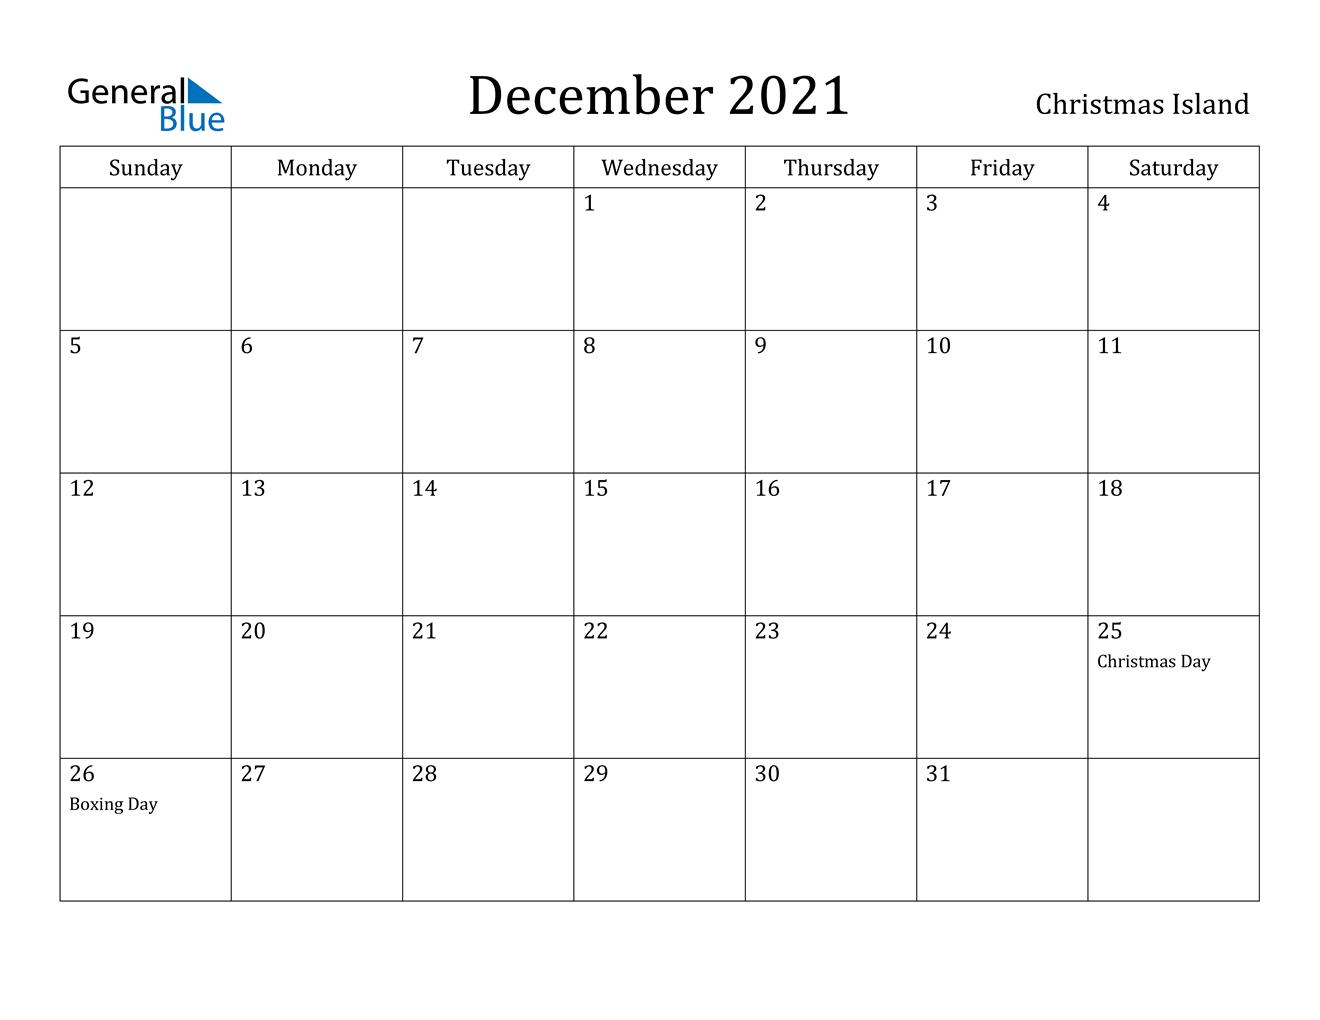 December 2021 Calendar - Christmas Island